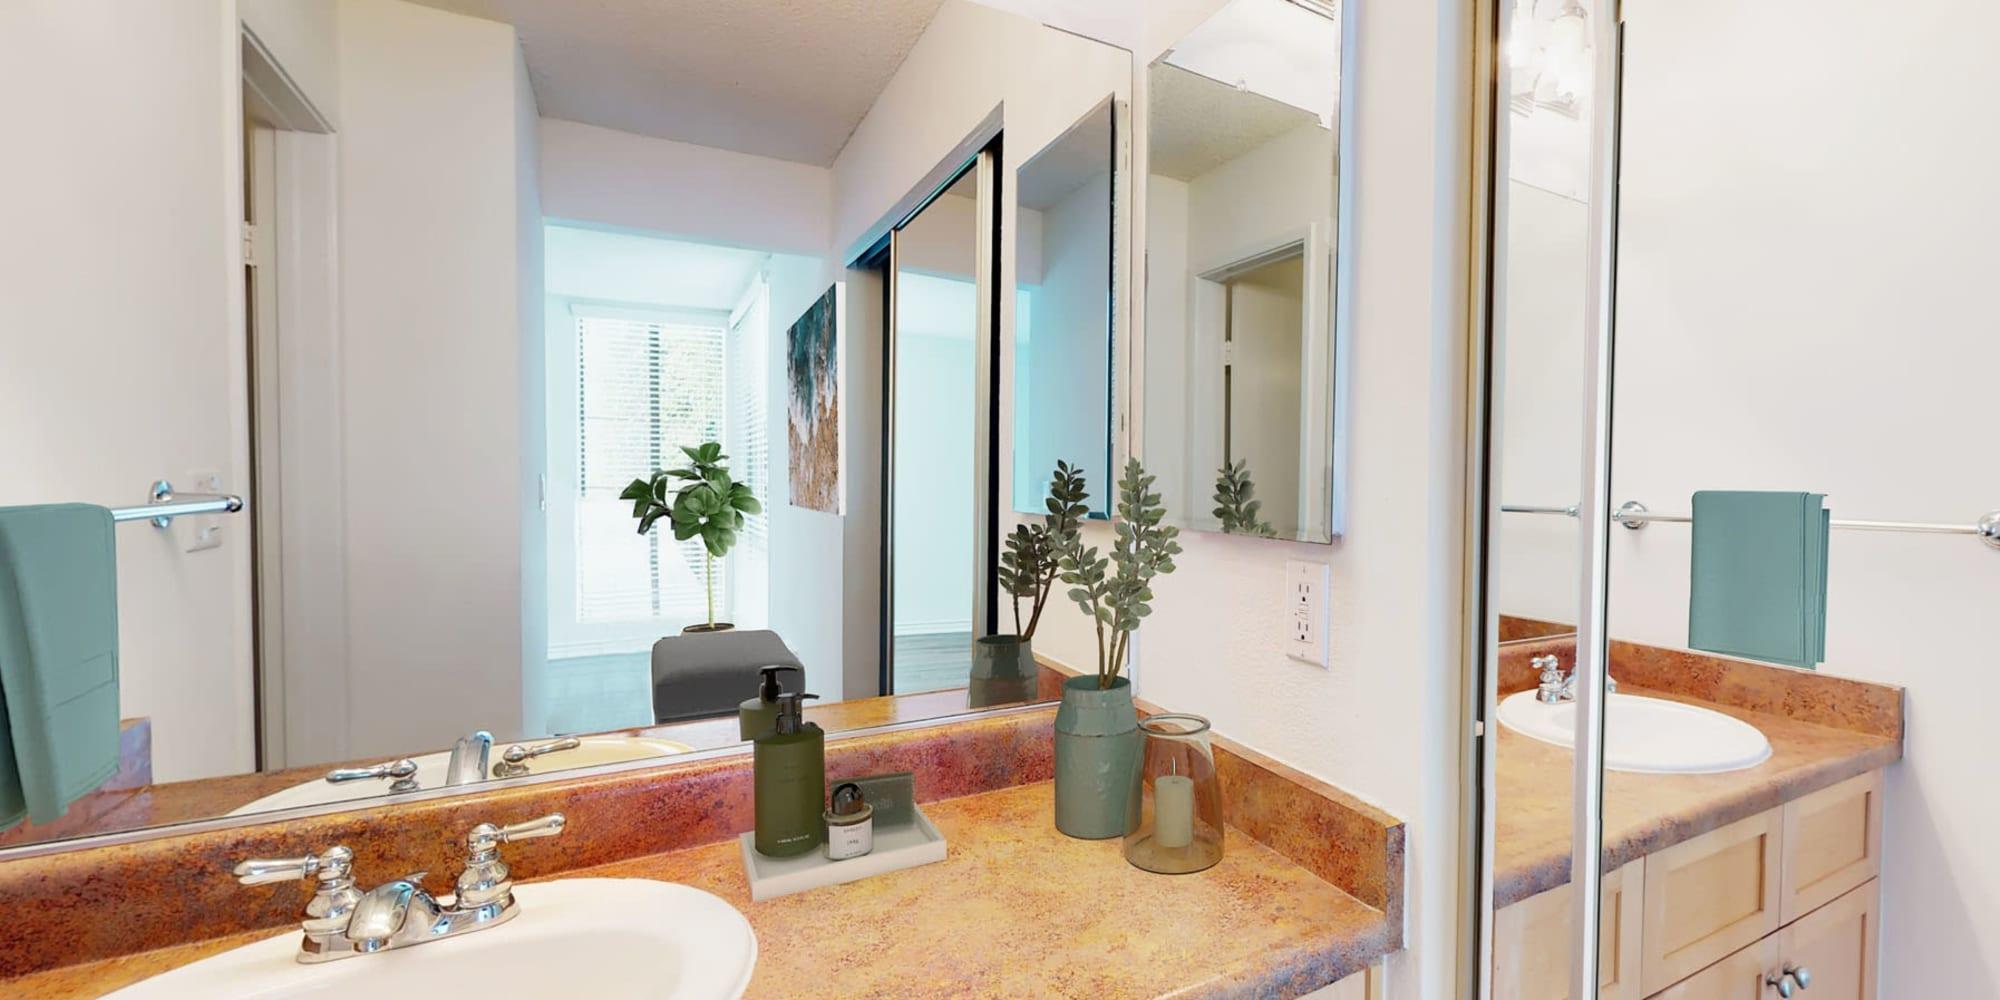 Extra full-length mirror in a model home's en suite primary bathroom at Mariners Village in Marina del Rey, California